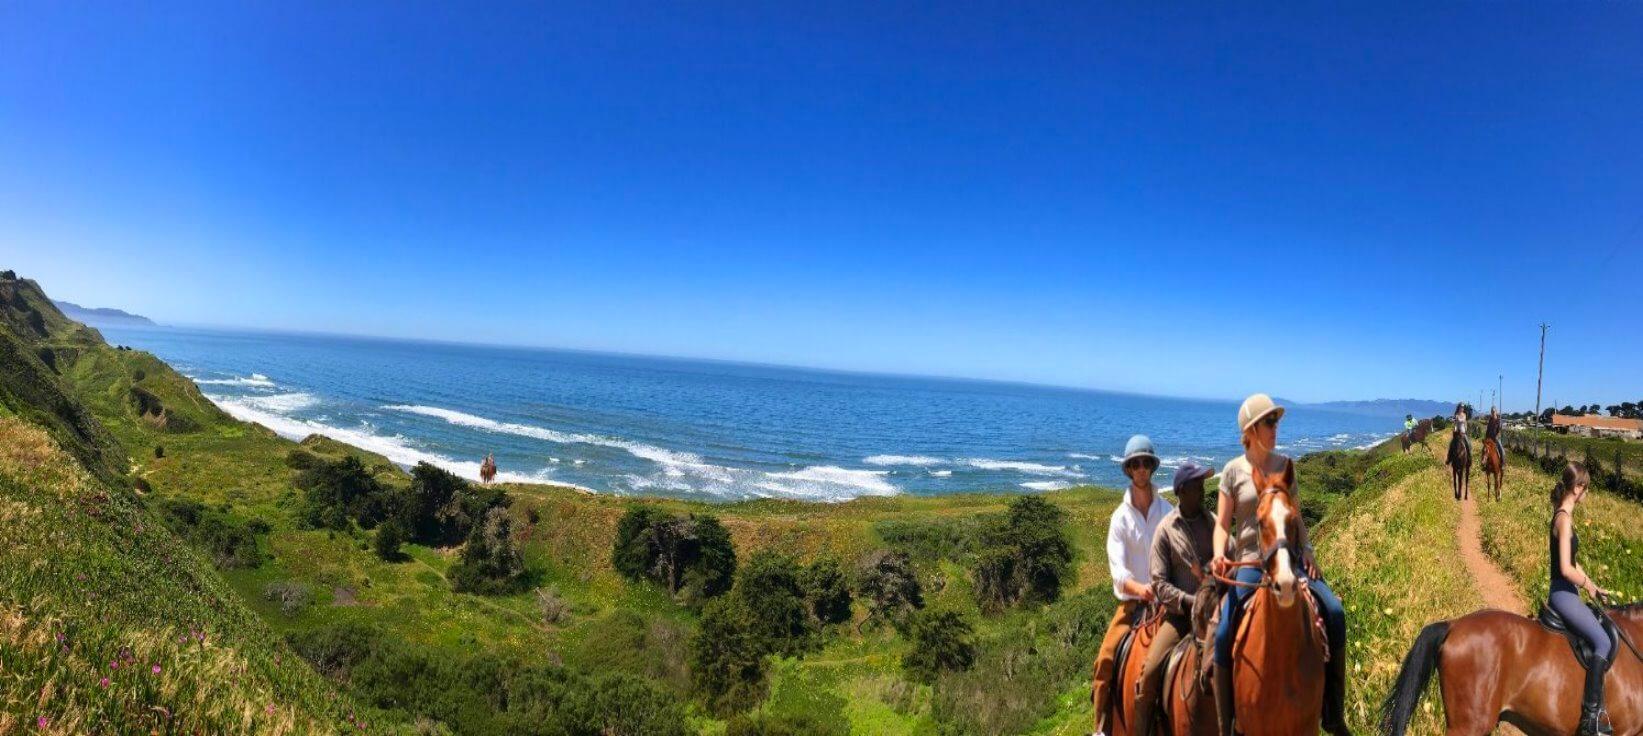 Horseback-Rides-on-The-Beach